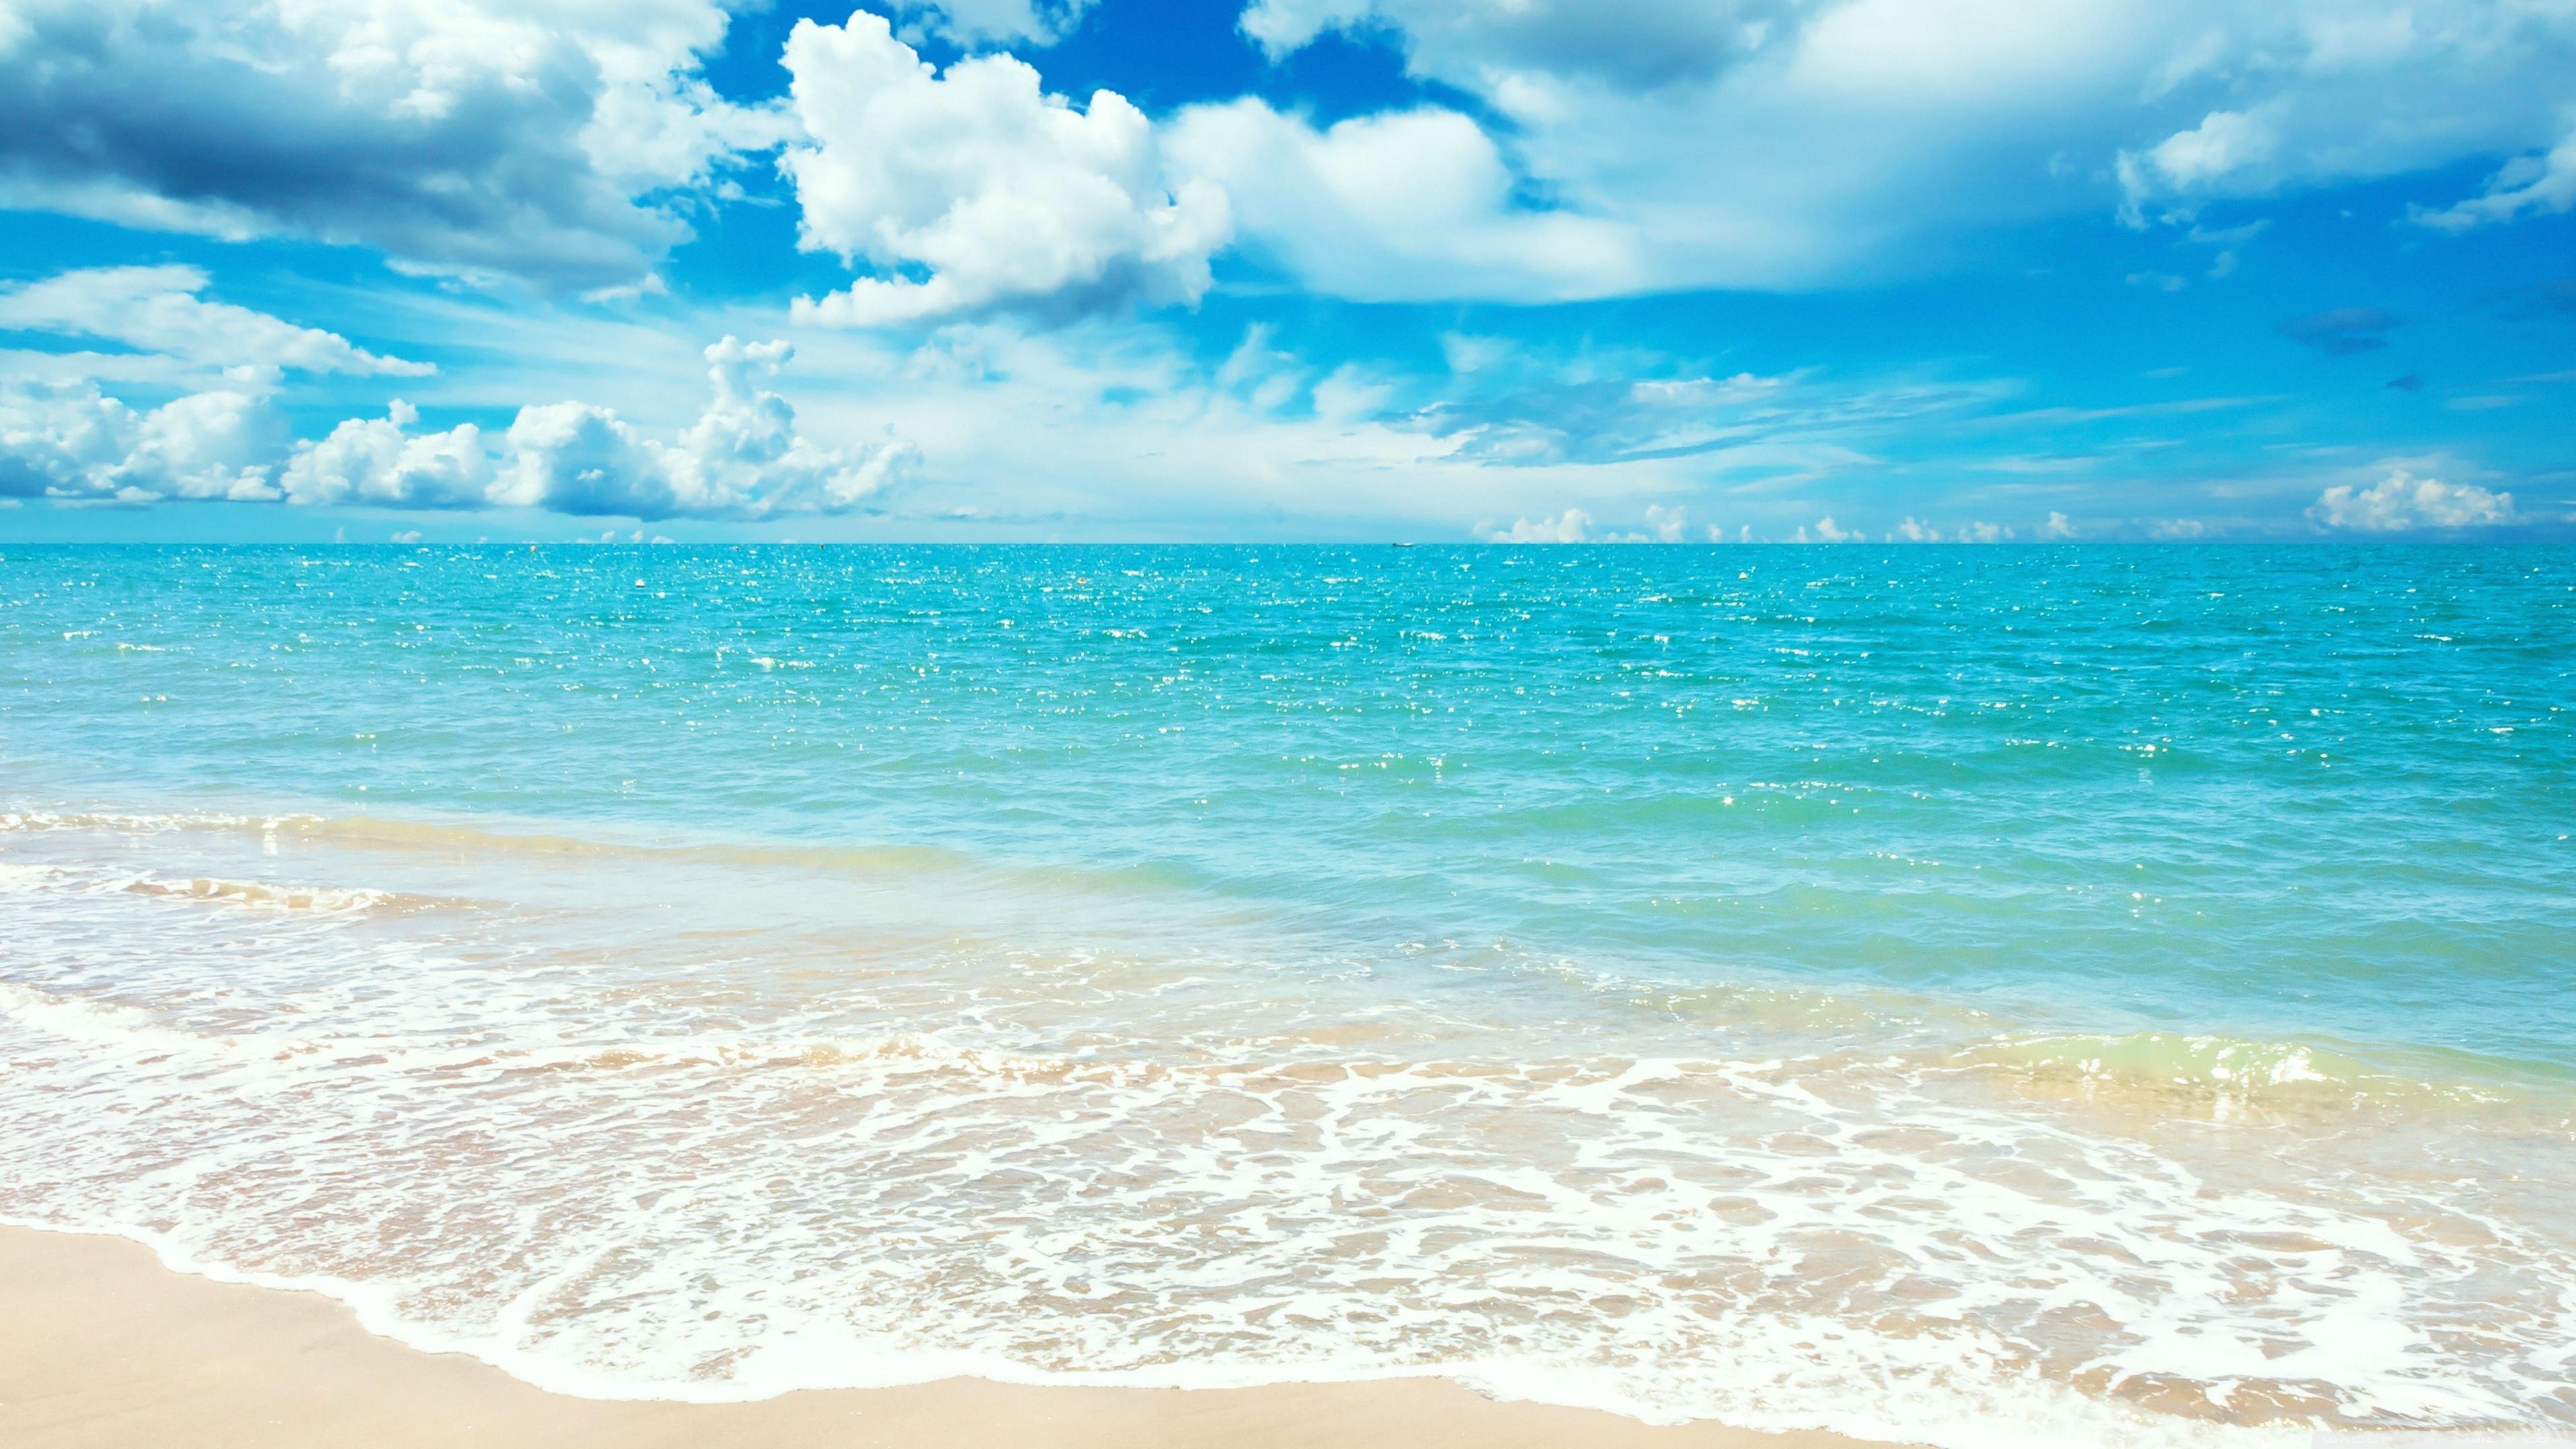 25] Sunny Day Wallpapers on WallpaperSafari 3840x2160